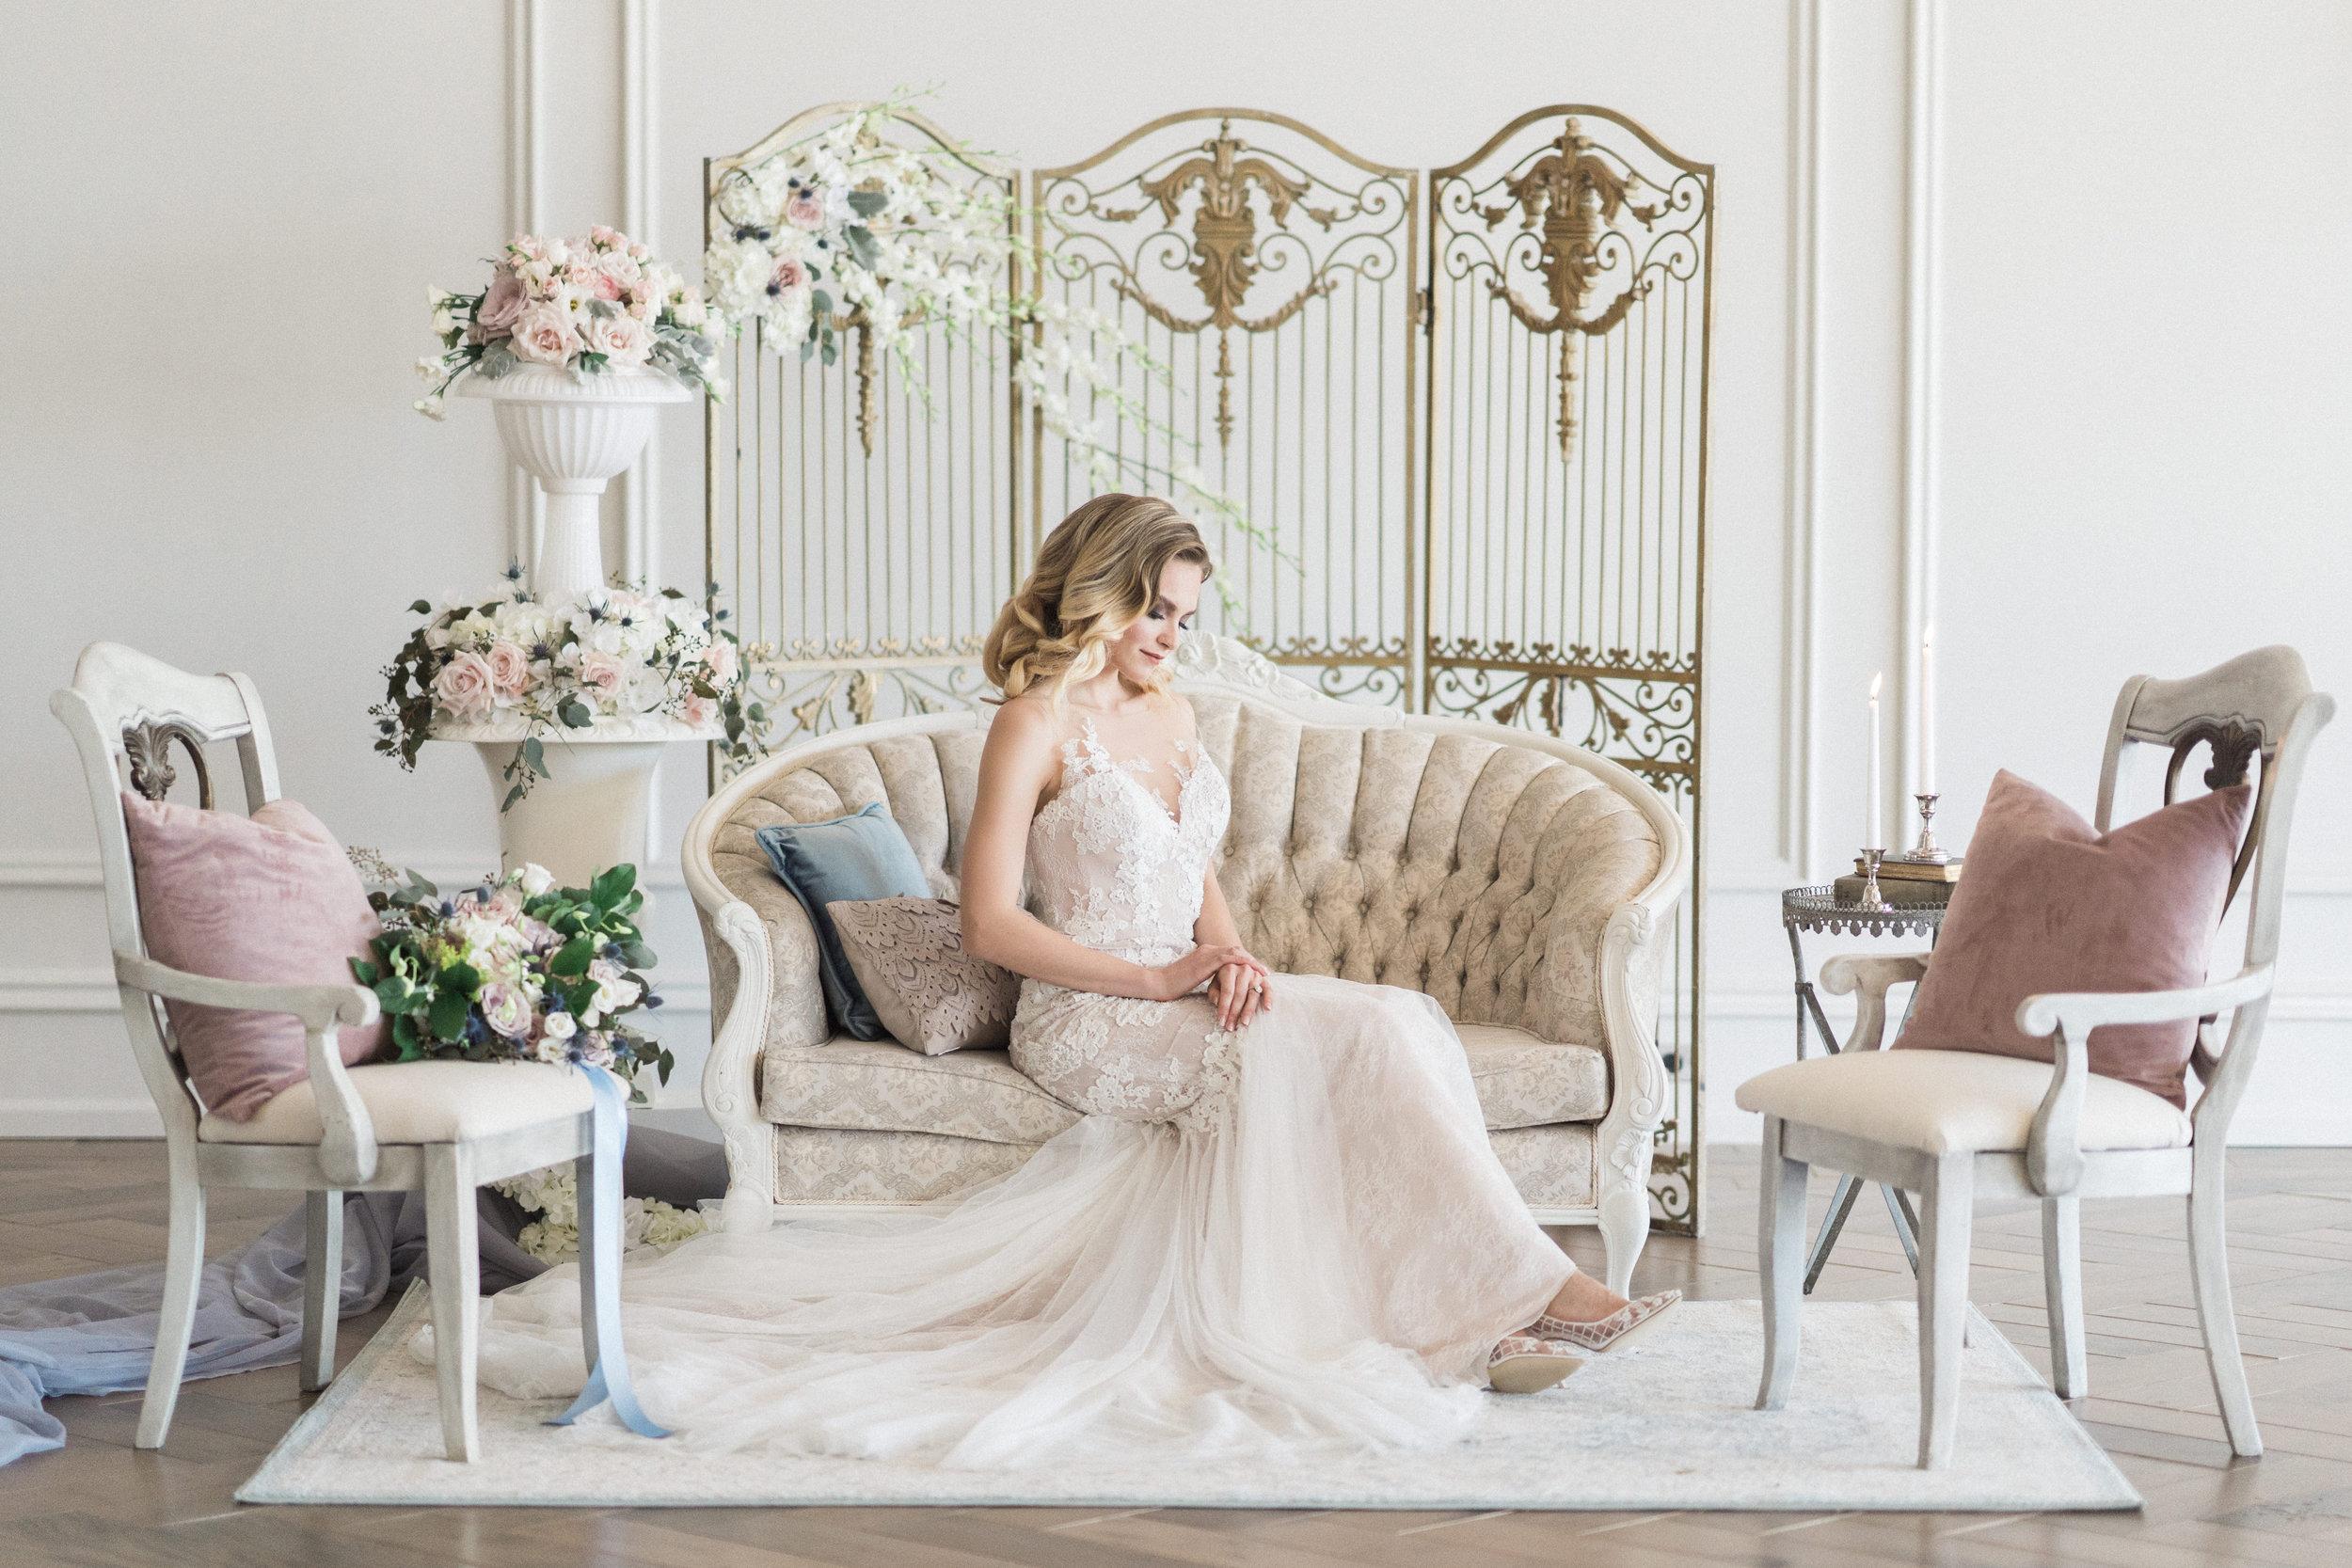 Arlington_Estates_Wedding_Photos-Rhythm_Photography-069.jpg